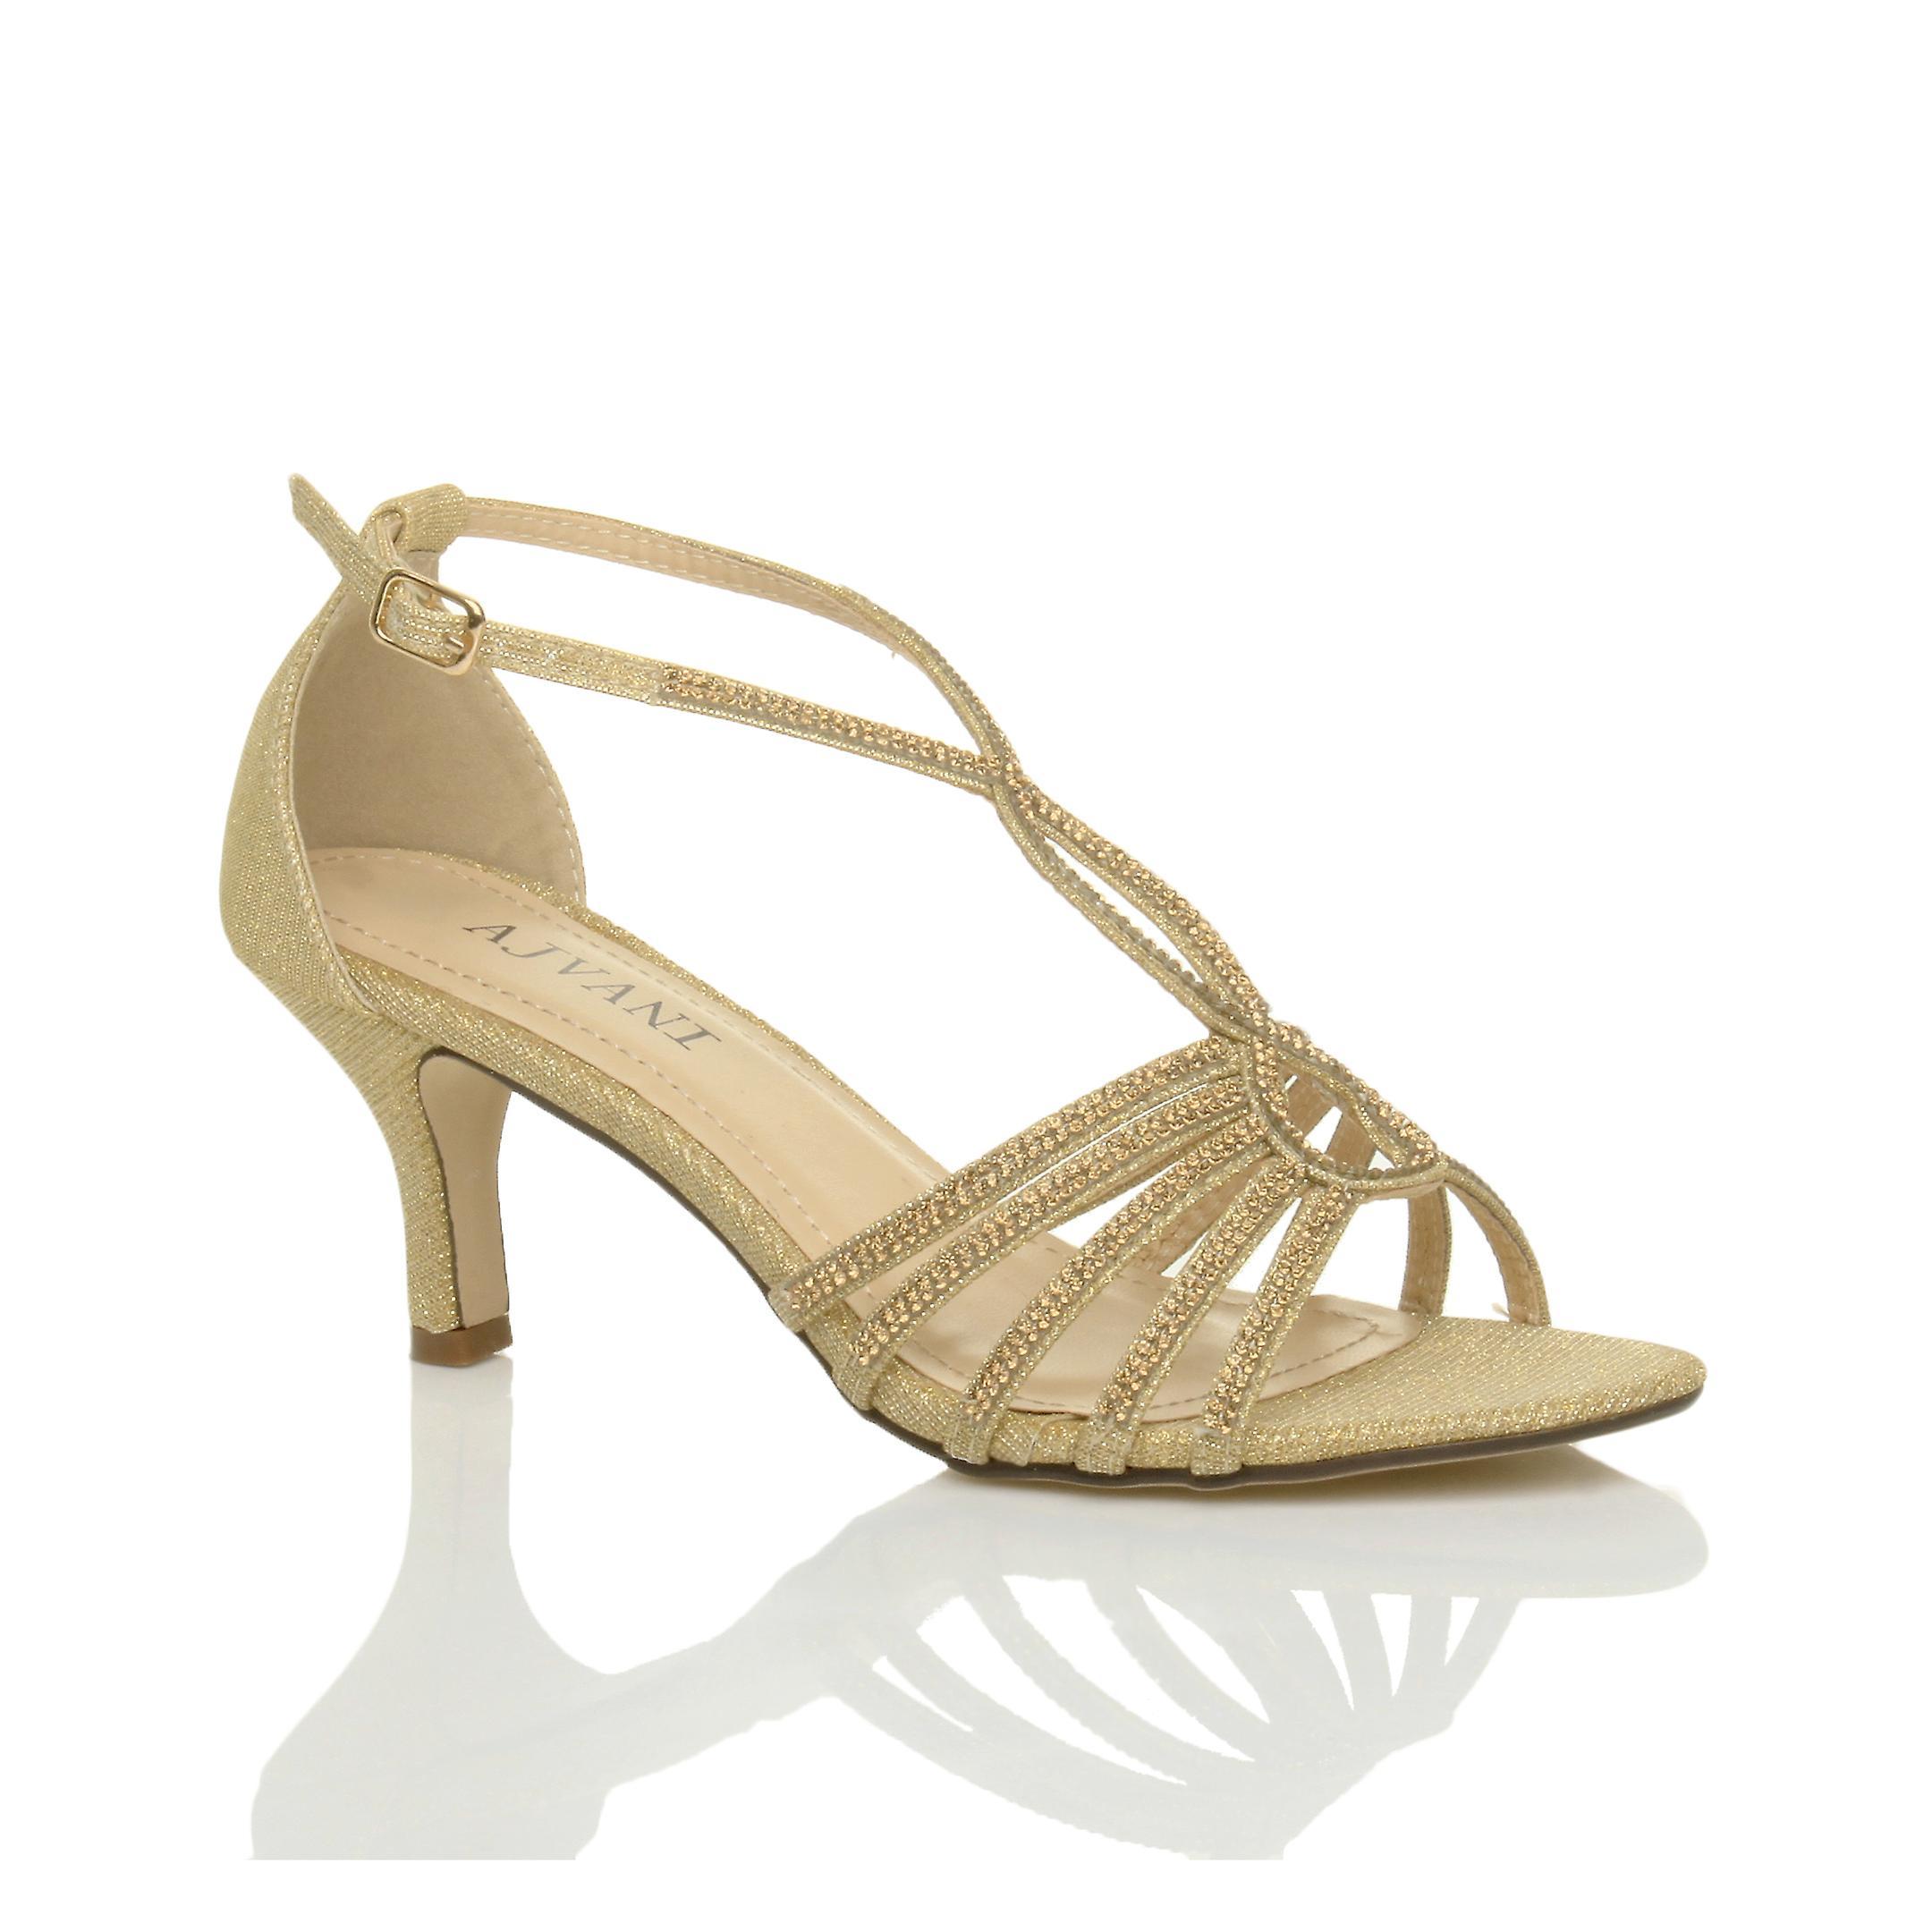 Ajvani womens mid heel strappy diamante glitter bridal wedding evening t bar sandals shoes